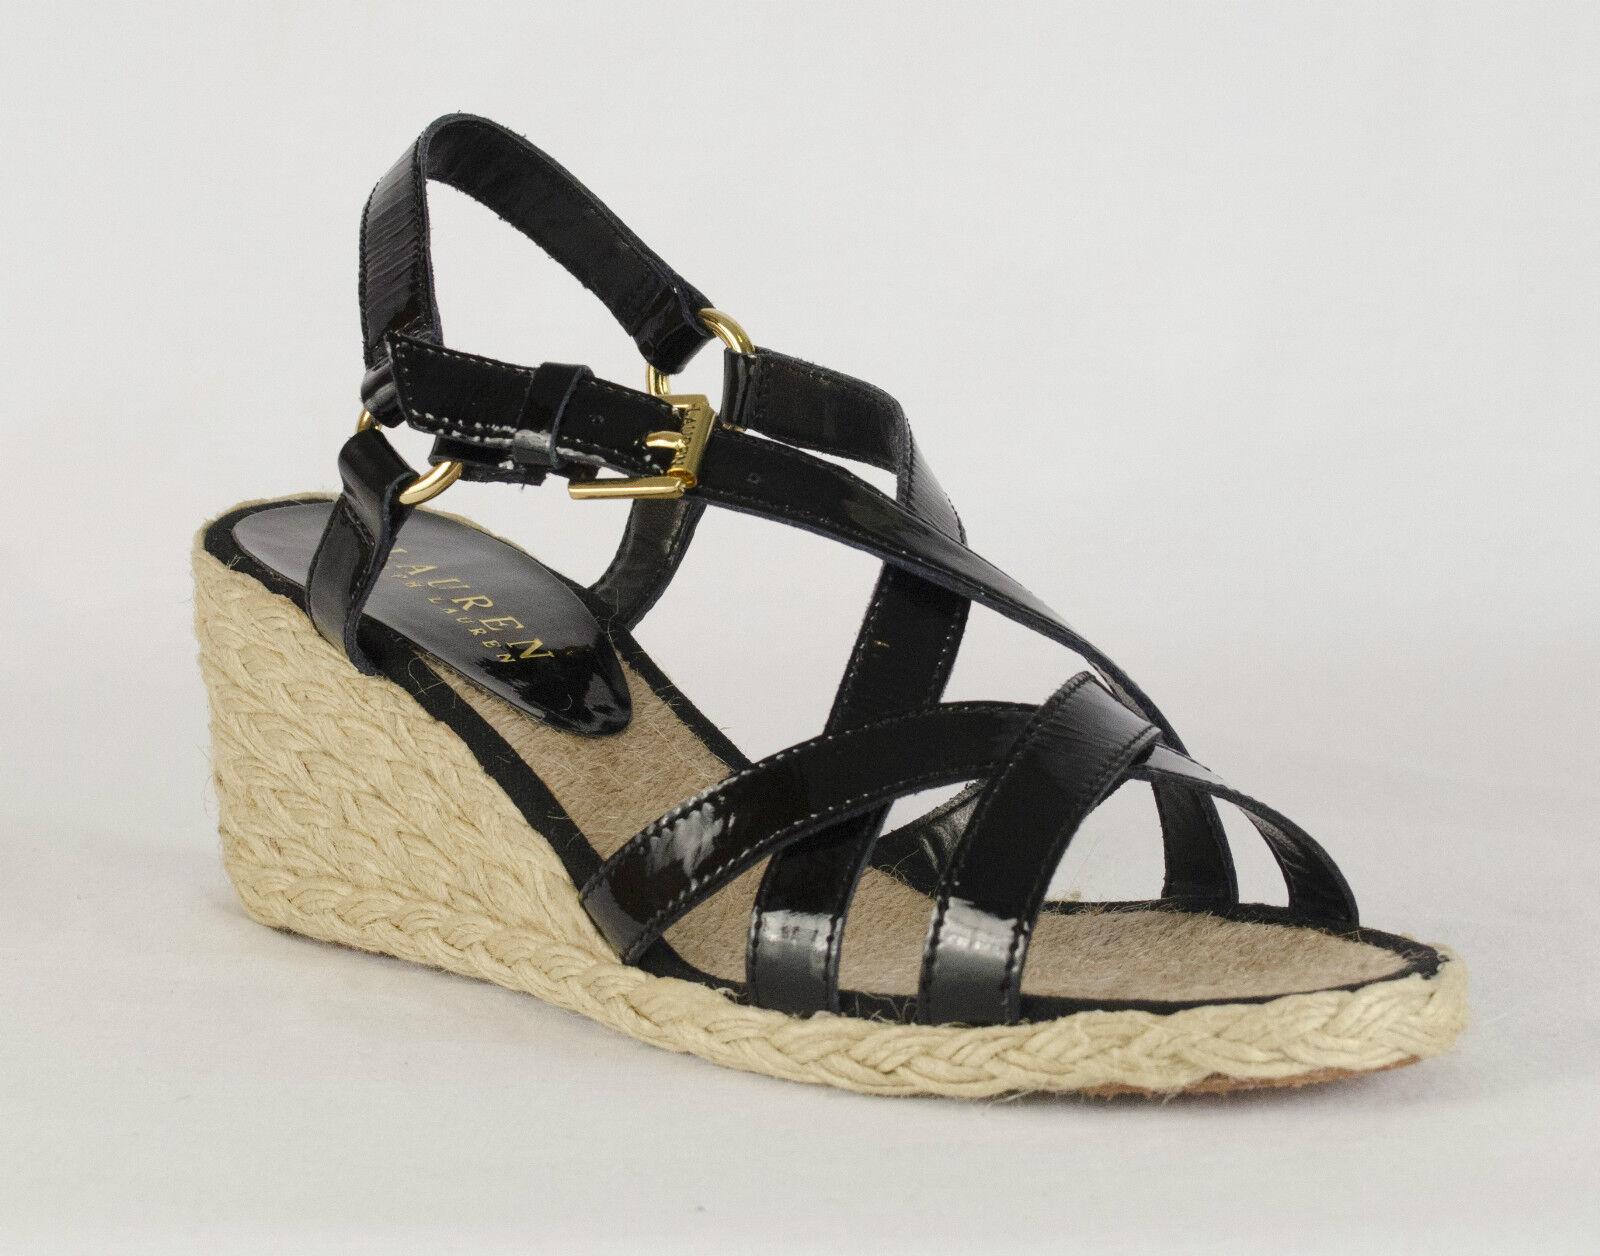 RALPH LAUREN CHRISSY BLACK PATENT Damenschuhe WEDGES SANDALS Schuhe MULTI SIZES AS